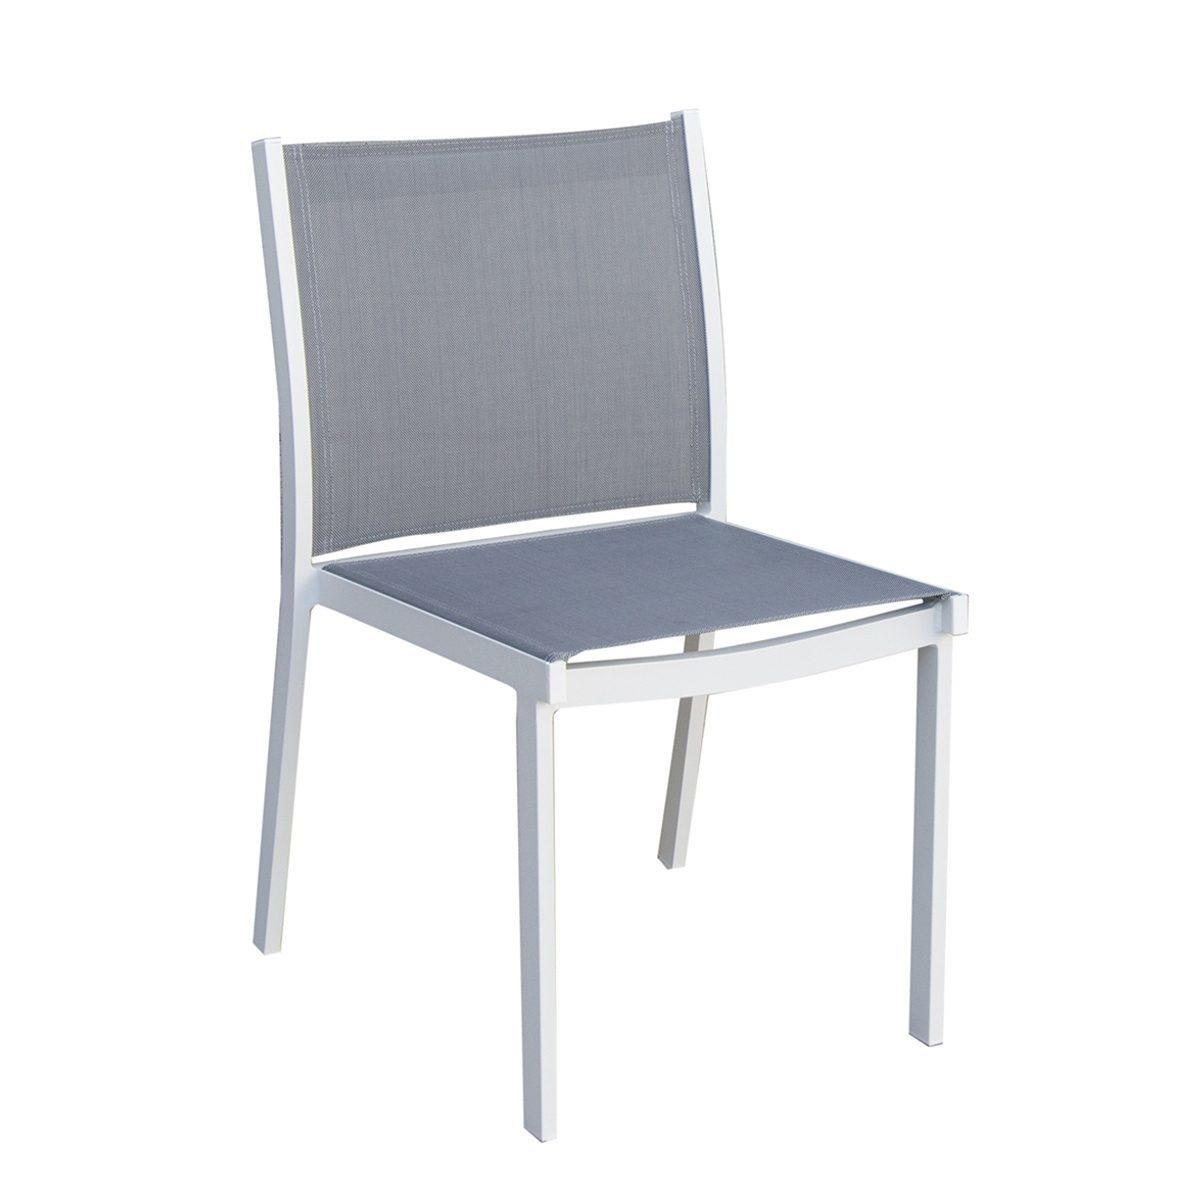 chaise de jardin en aluminium design exterieur terrasse panama tresi gespeed ce wmRm9 B Cg 1200x1200